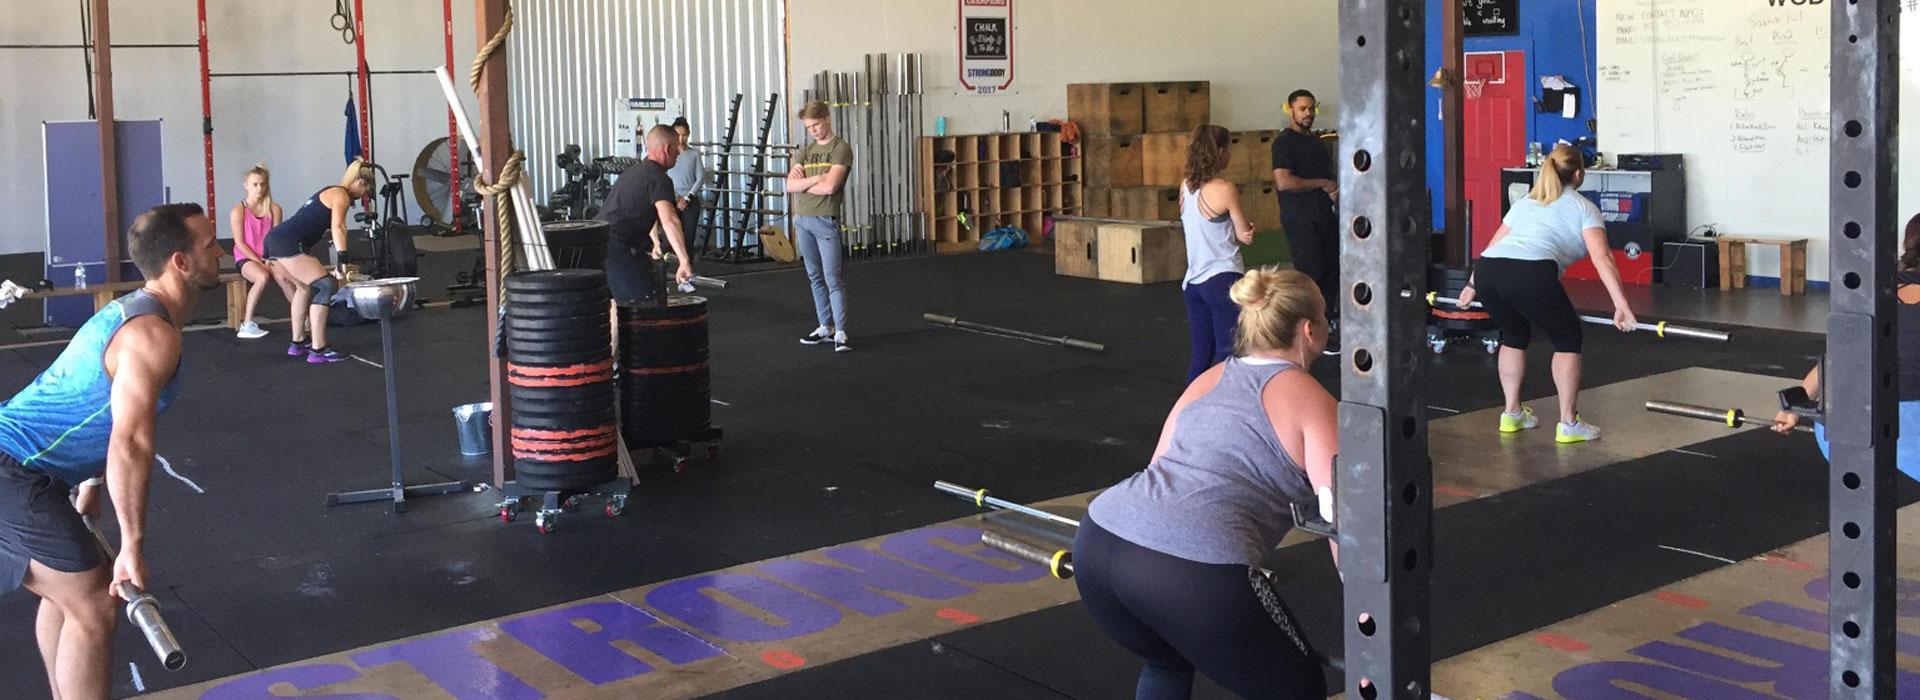 CrossFit Classes in Cypress TX, CrossFit Classes near Northwest Houston TX, CrossFit Classes near Houston TX